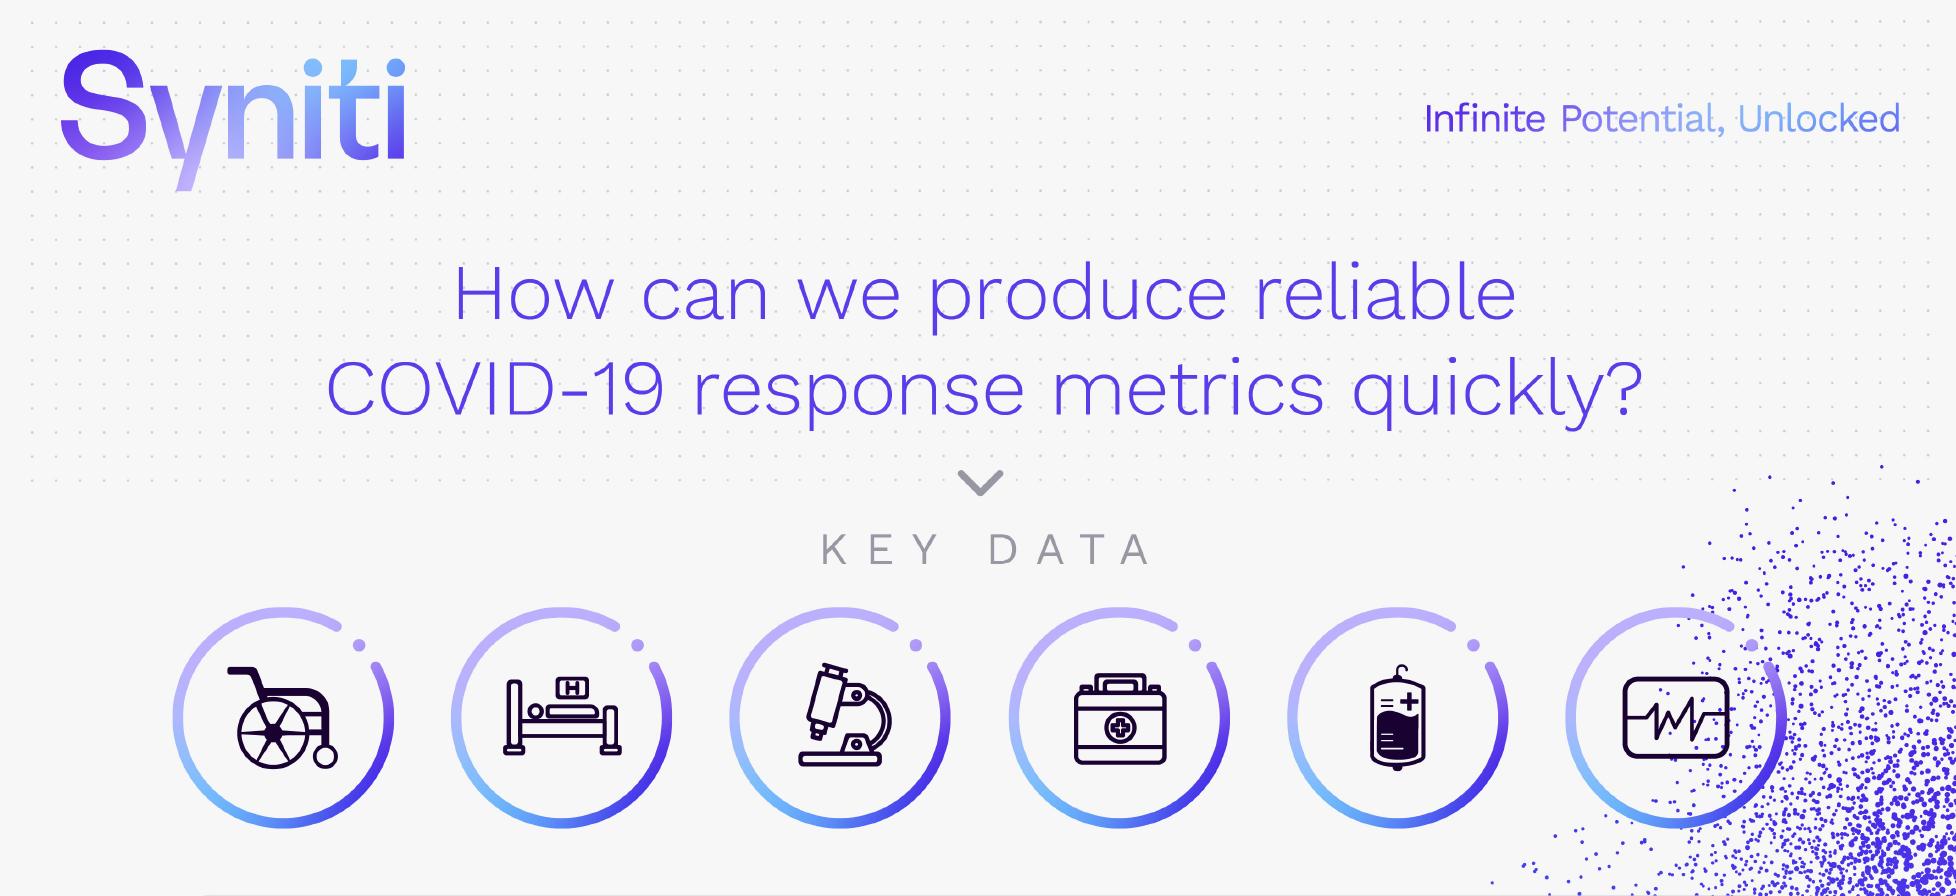 COVID-19 Rapid Response: Reliable COVID-19 Metrics